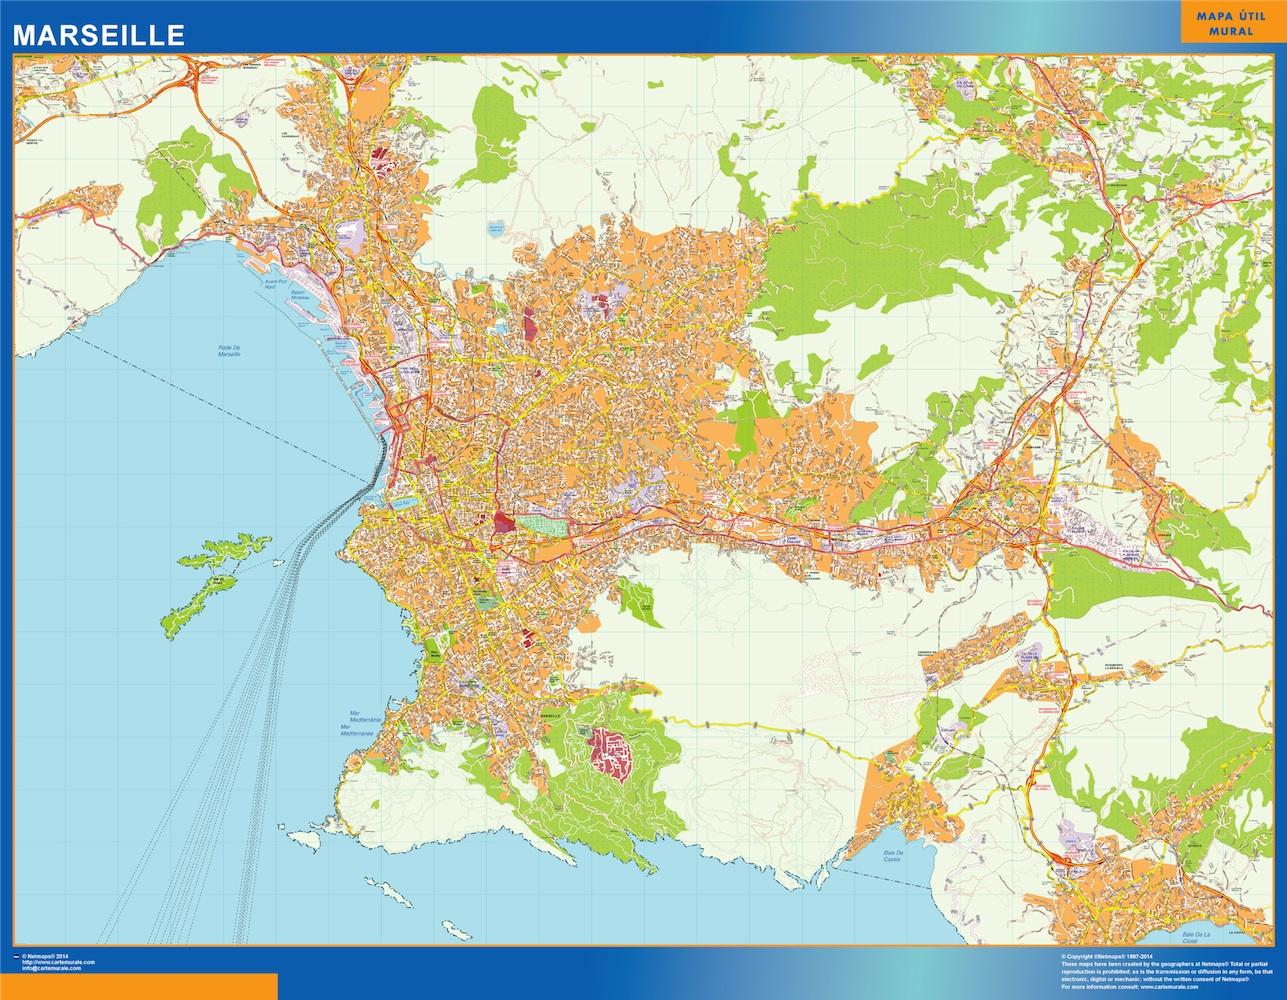 marseille street map